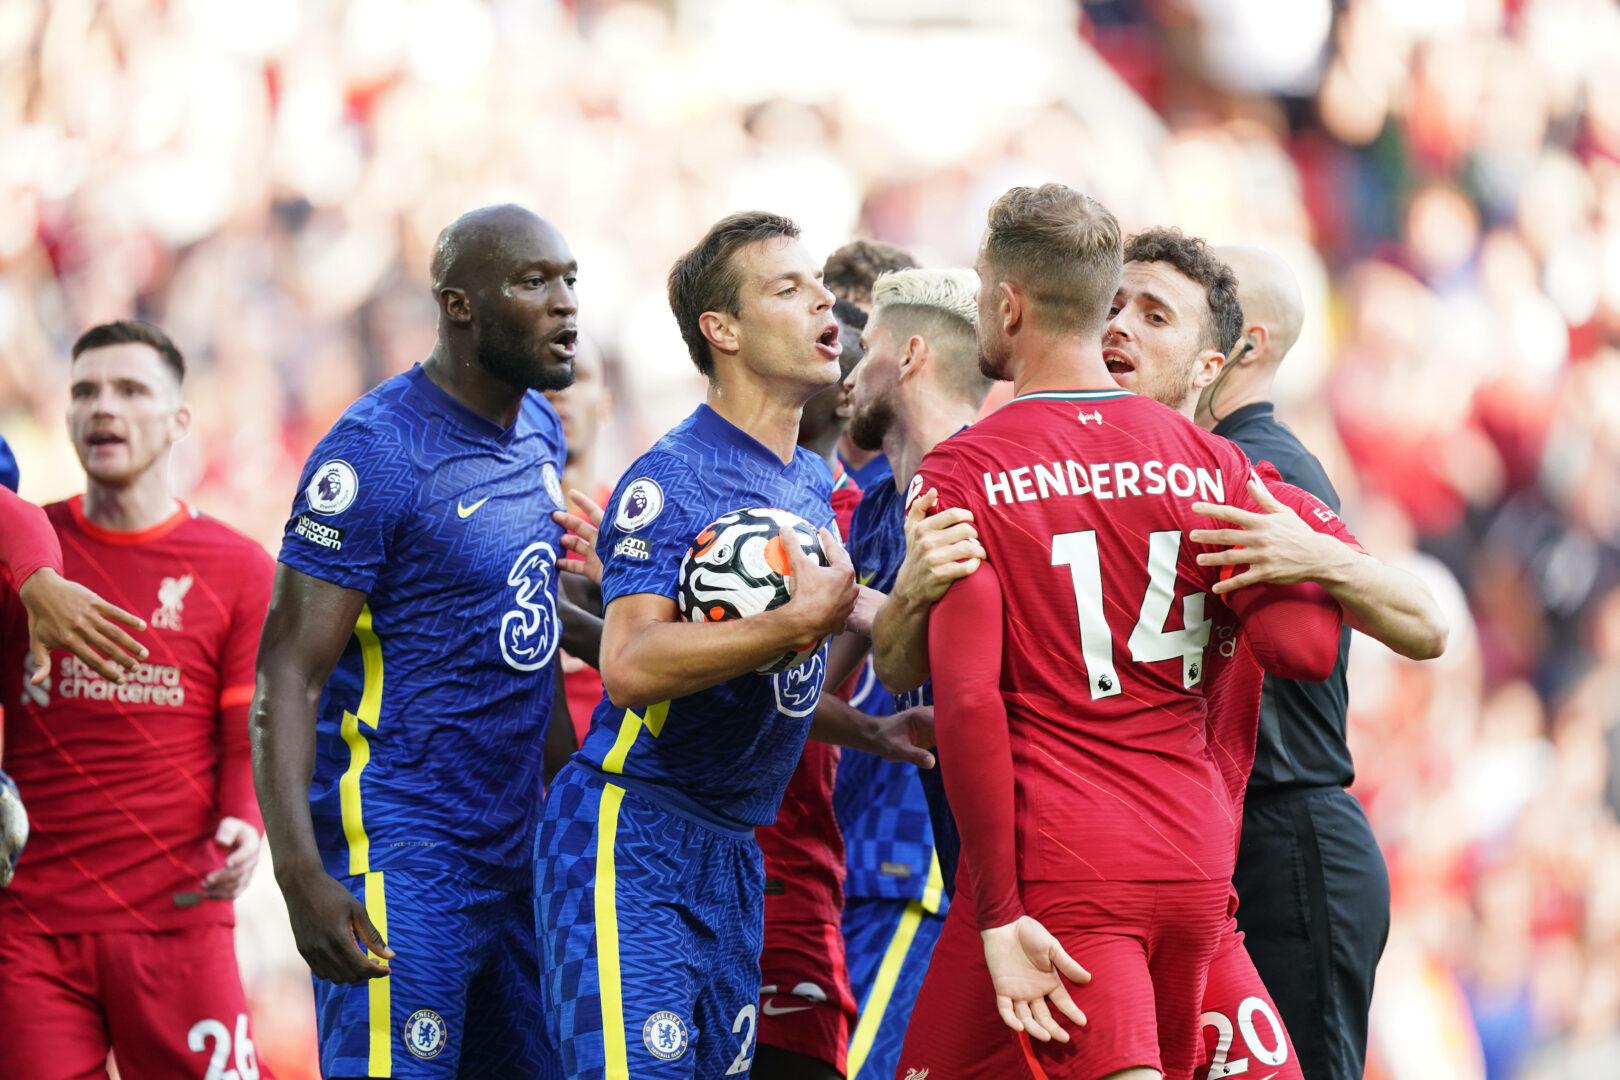 Henderson (Liverpool) Azpilicueta (Chelsea) im Clinch